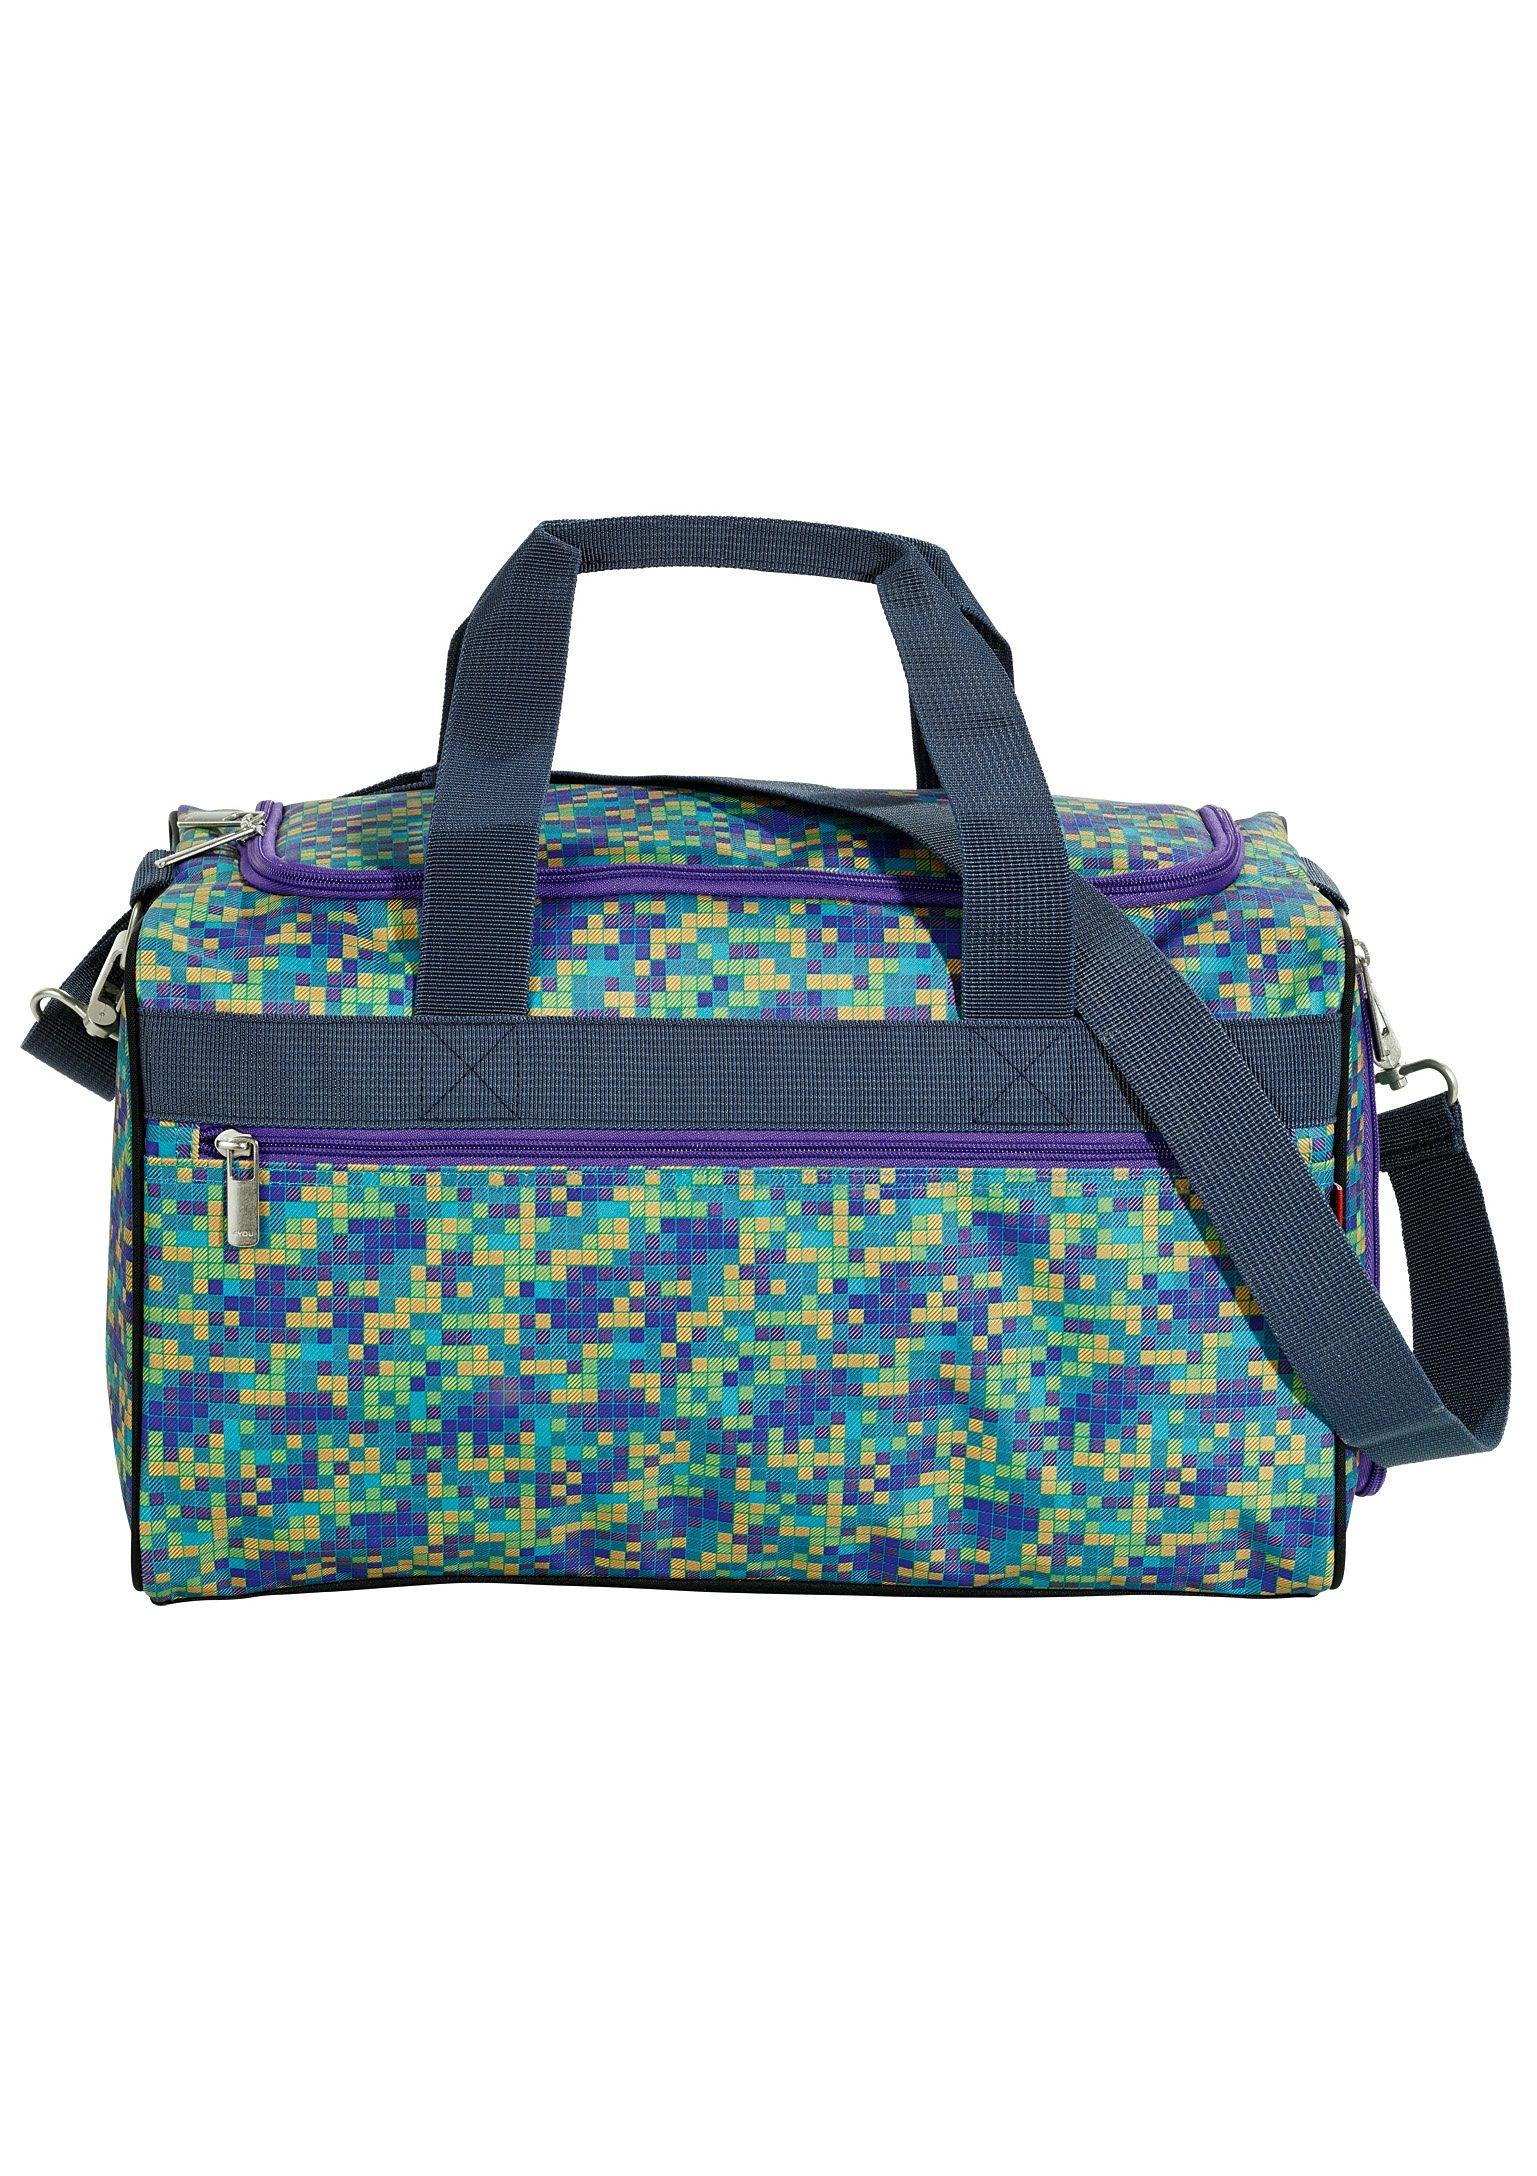 4YOU Sporttasche, Pixel Smaragd, »Sportbag M«